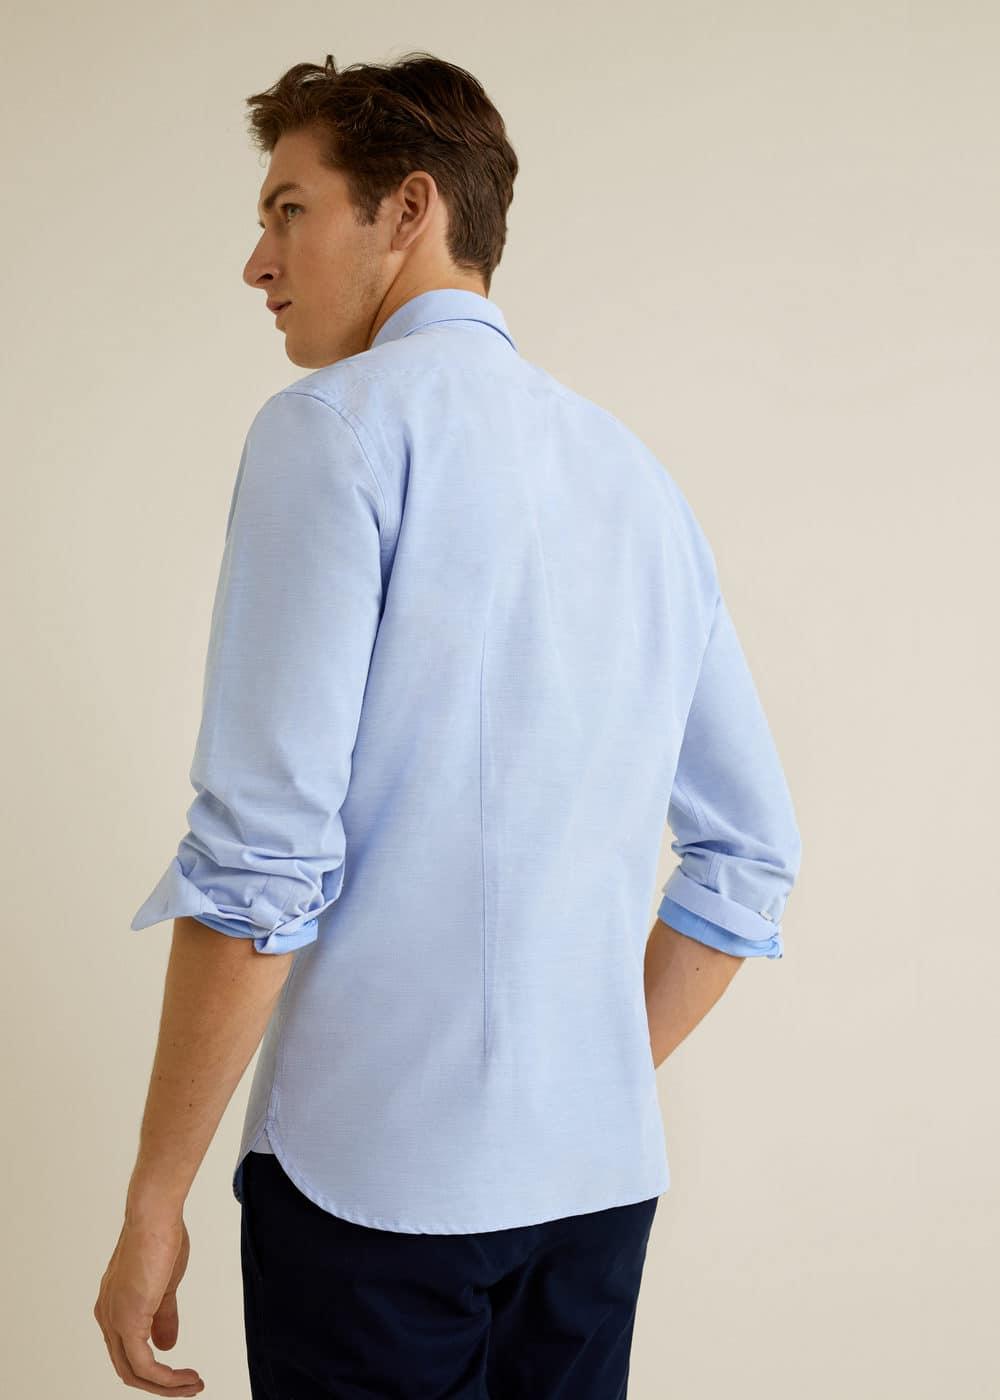 Mango - Camisa slim-fit estructura rayas - 3